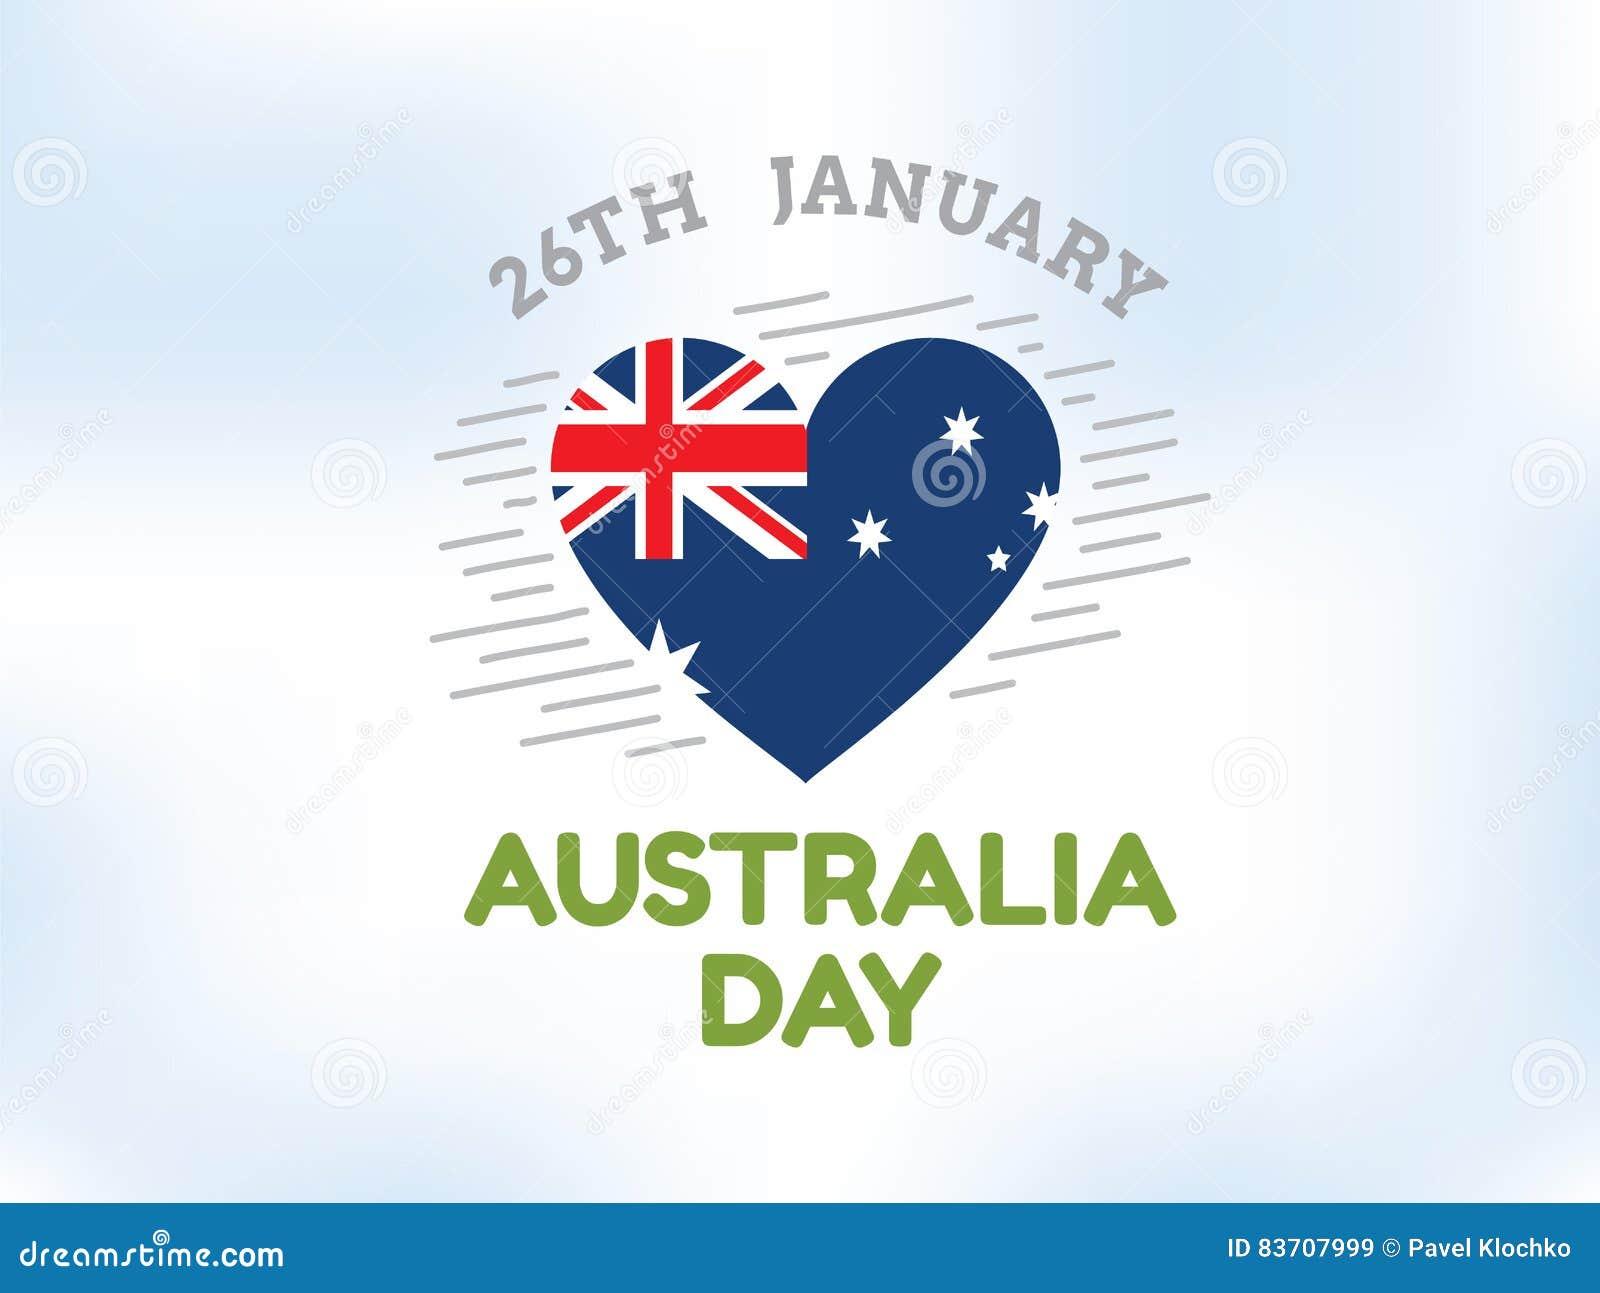 Happy Australia Day Vector Design. Stock Vector